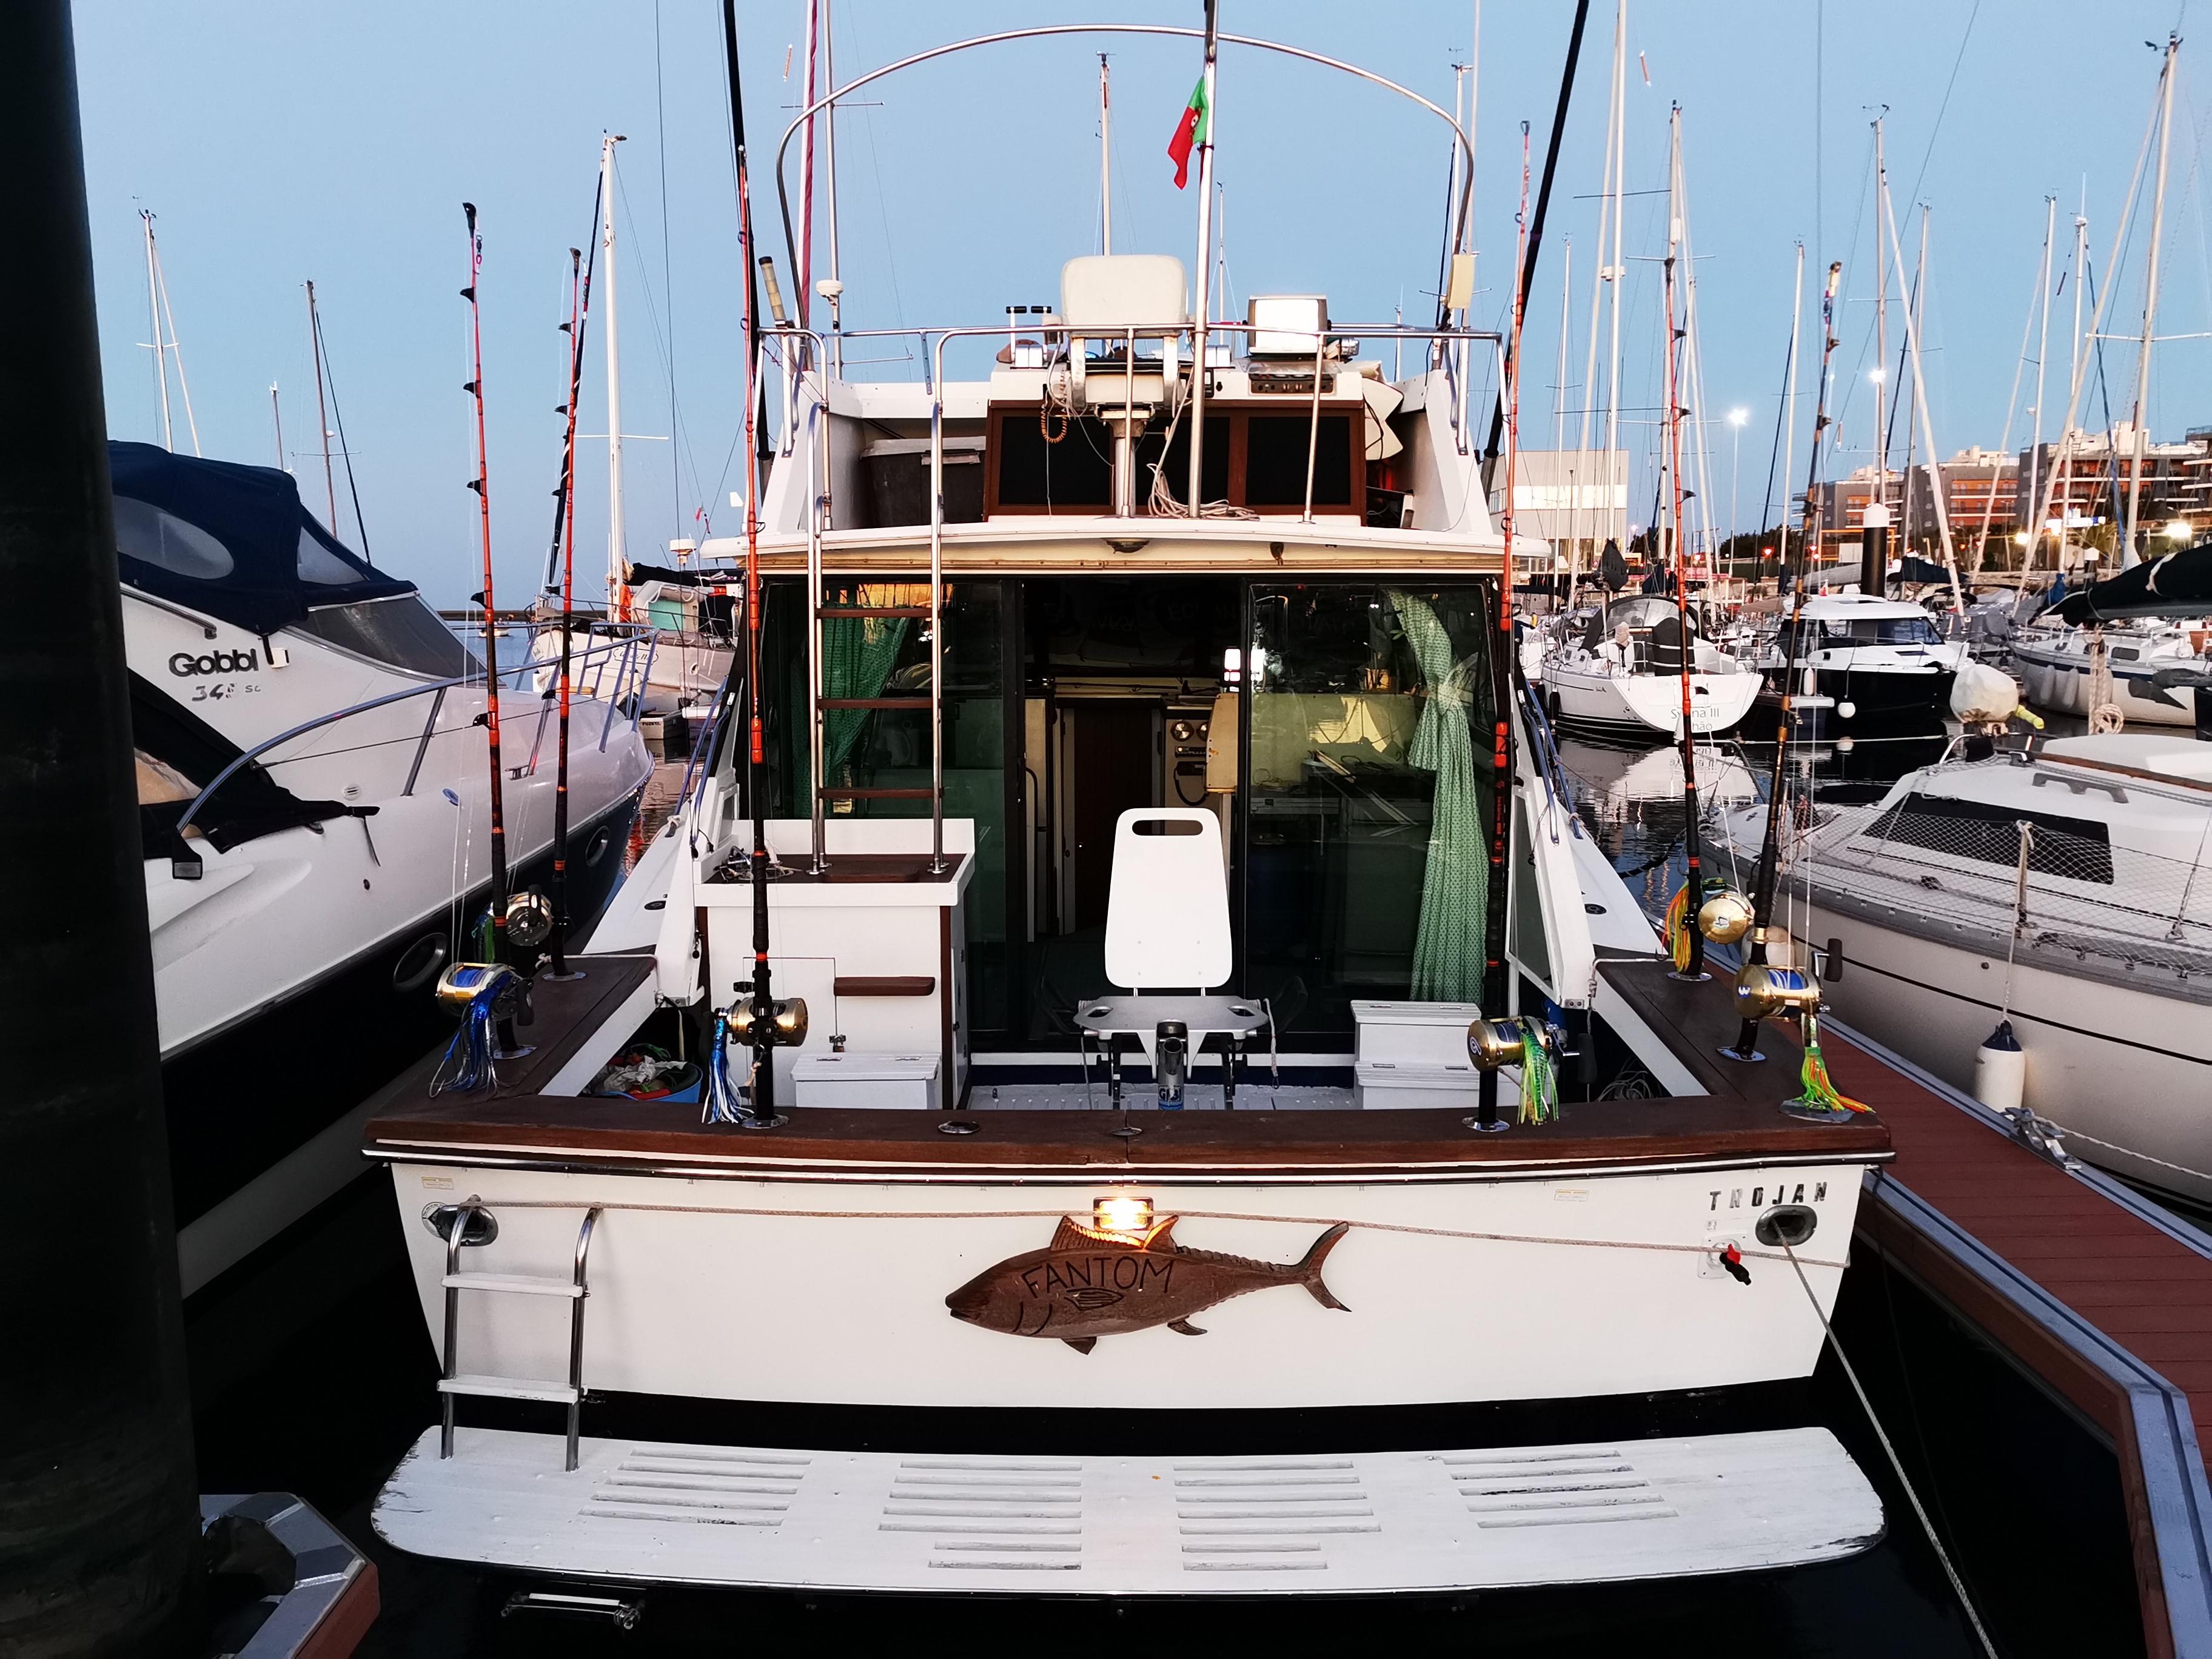 bateau charter peche au gros portugal